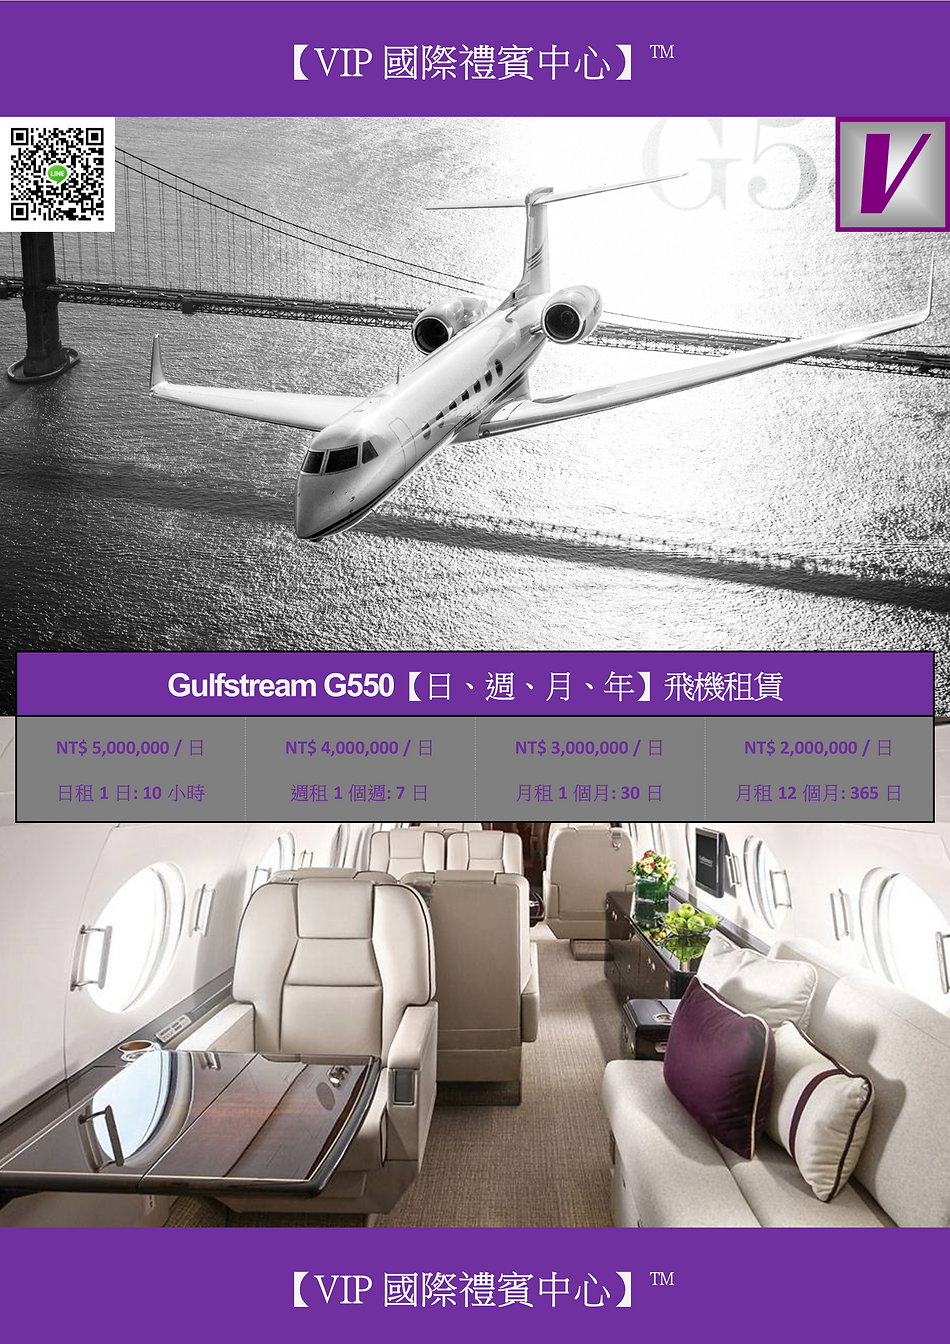 VIP國際禮賓中心 GULFSTREAM G550 DM.png